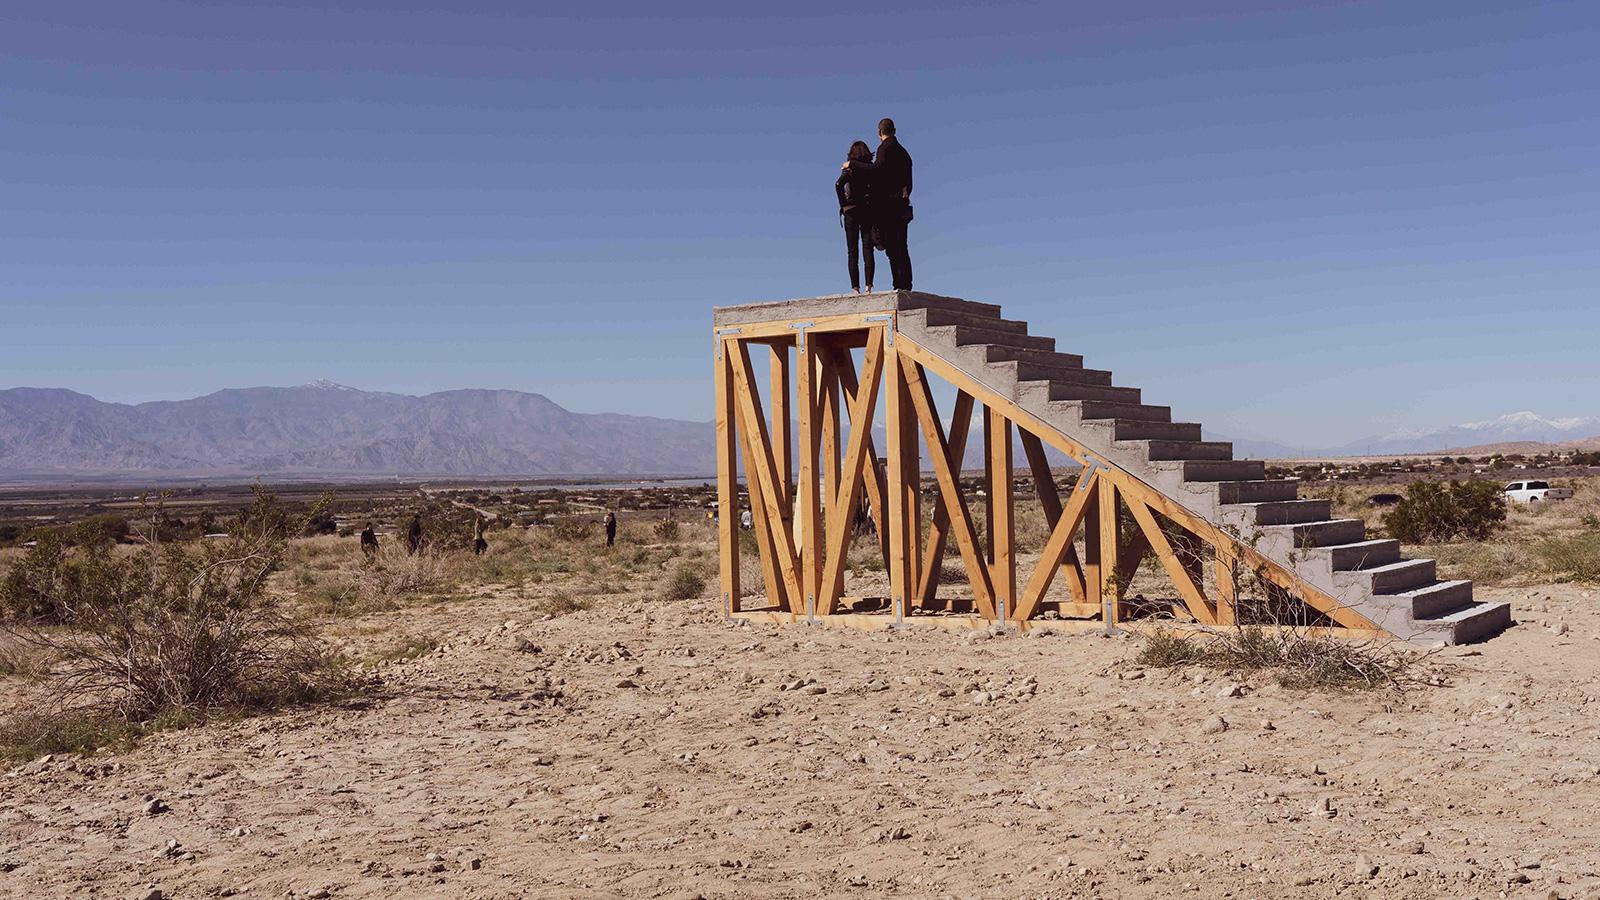 Iván Argote 'A Point of View'